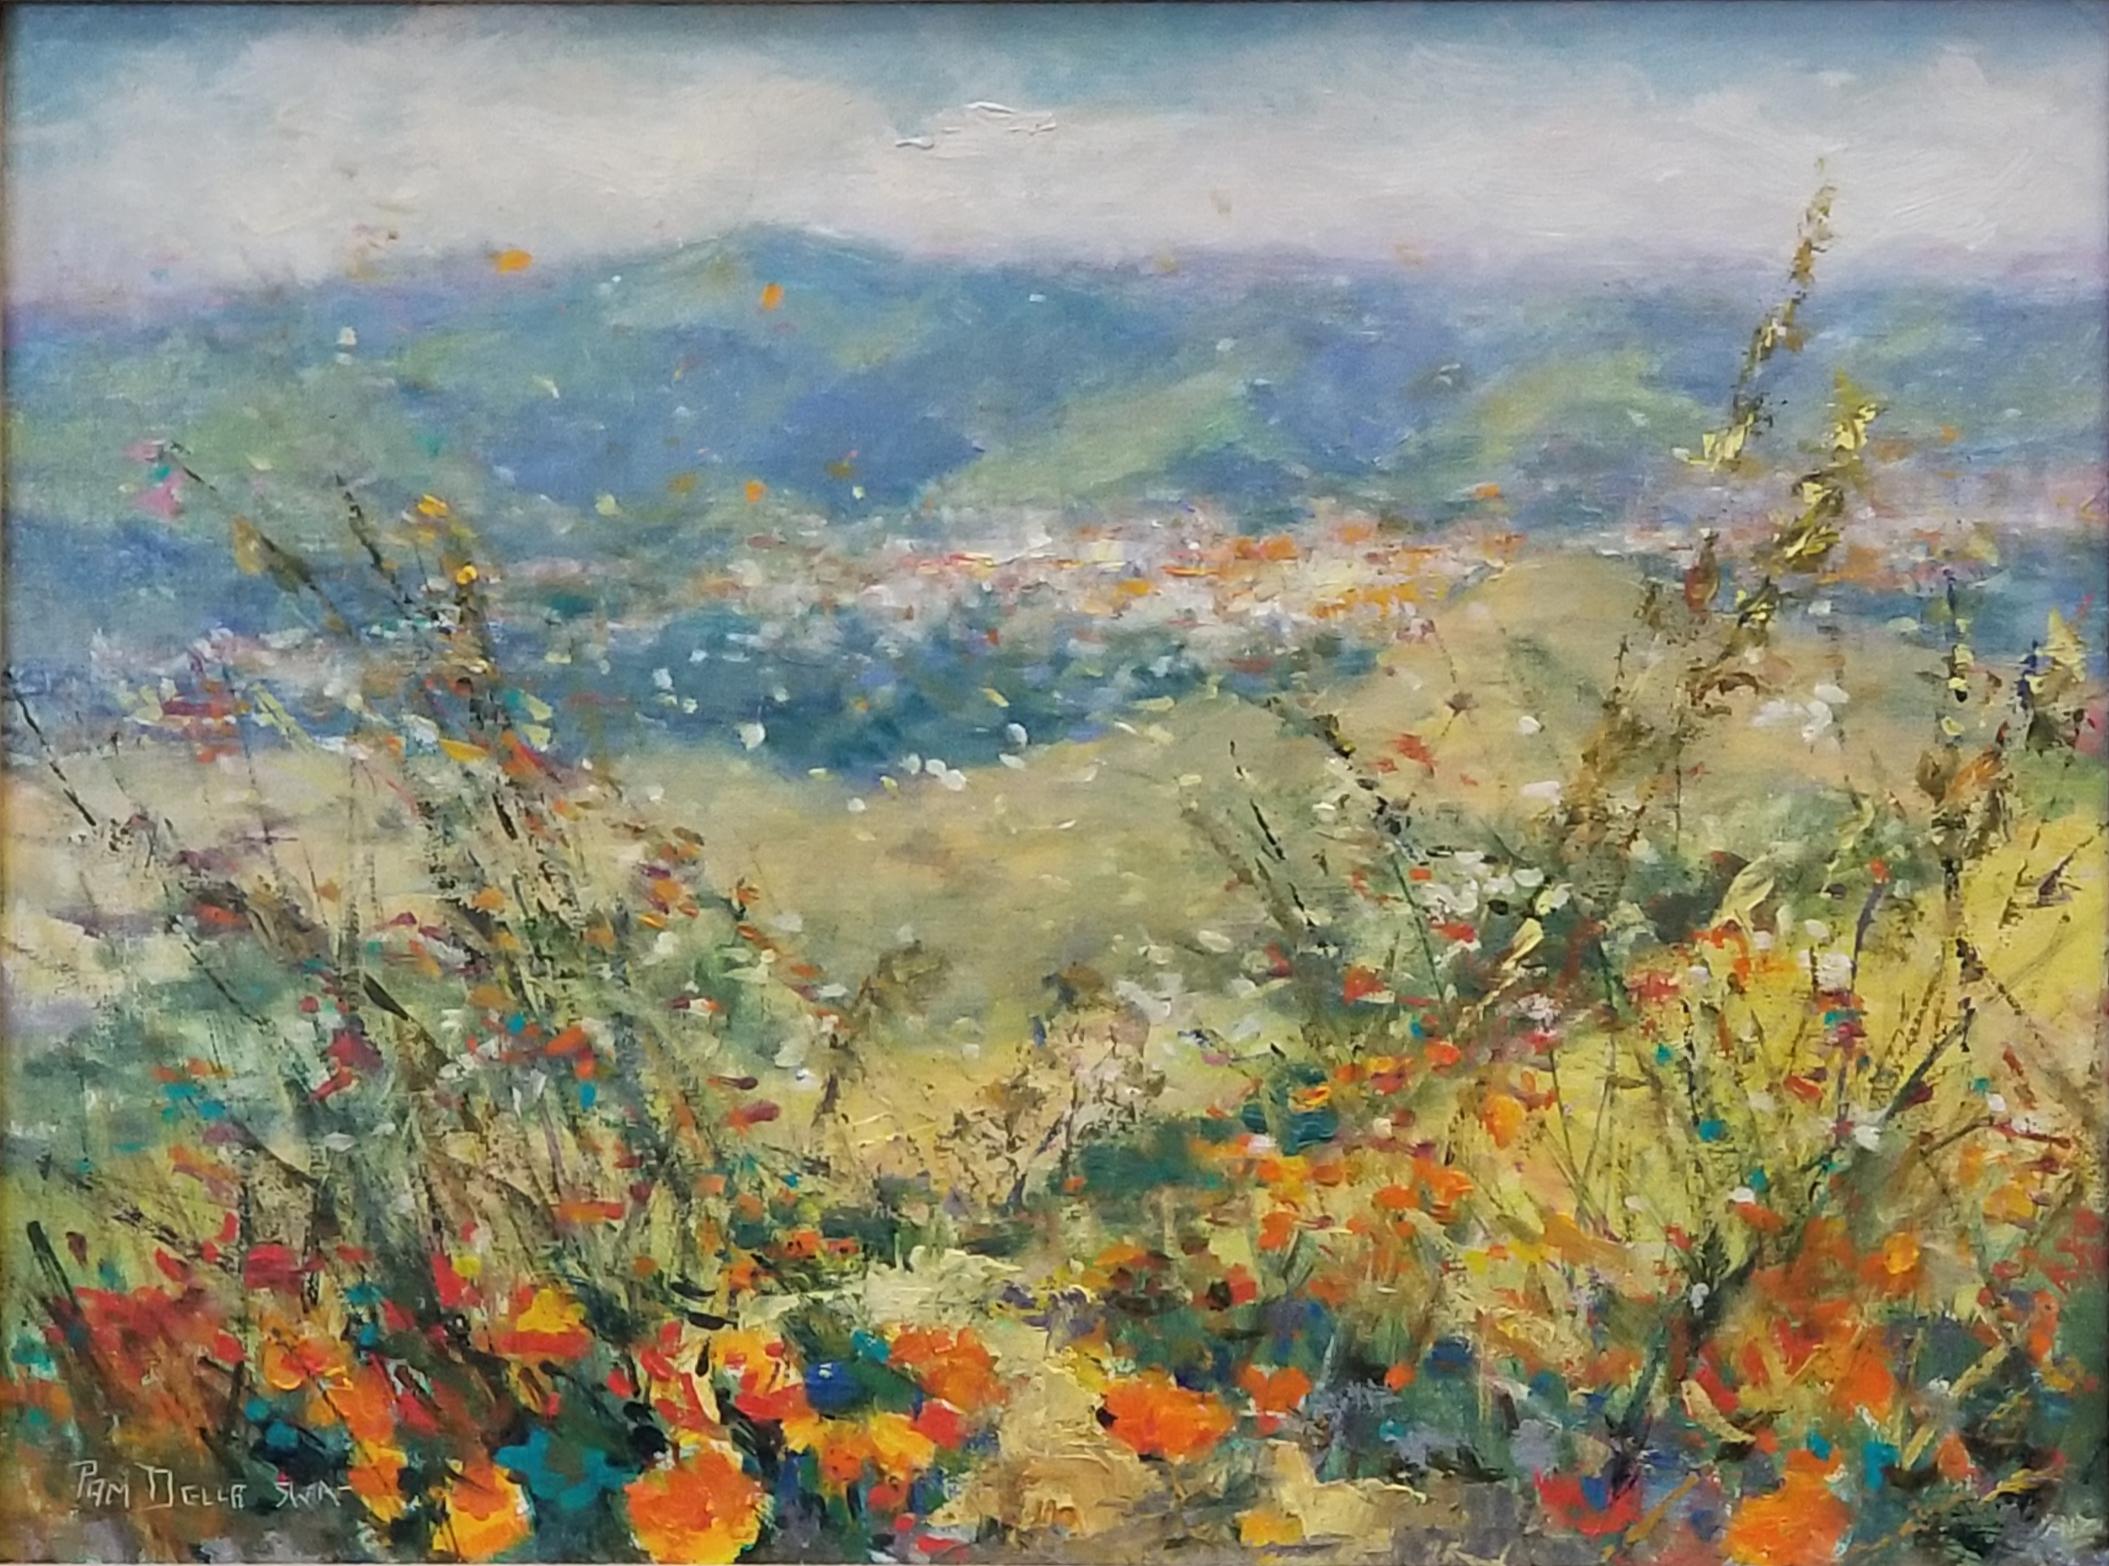 Walnut Creek View from Mt. Diablo:Pam Della, 12 x 16, oil on canvas, $800